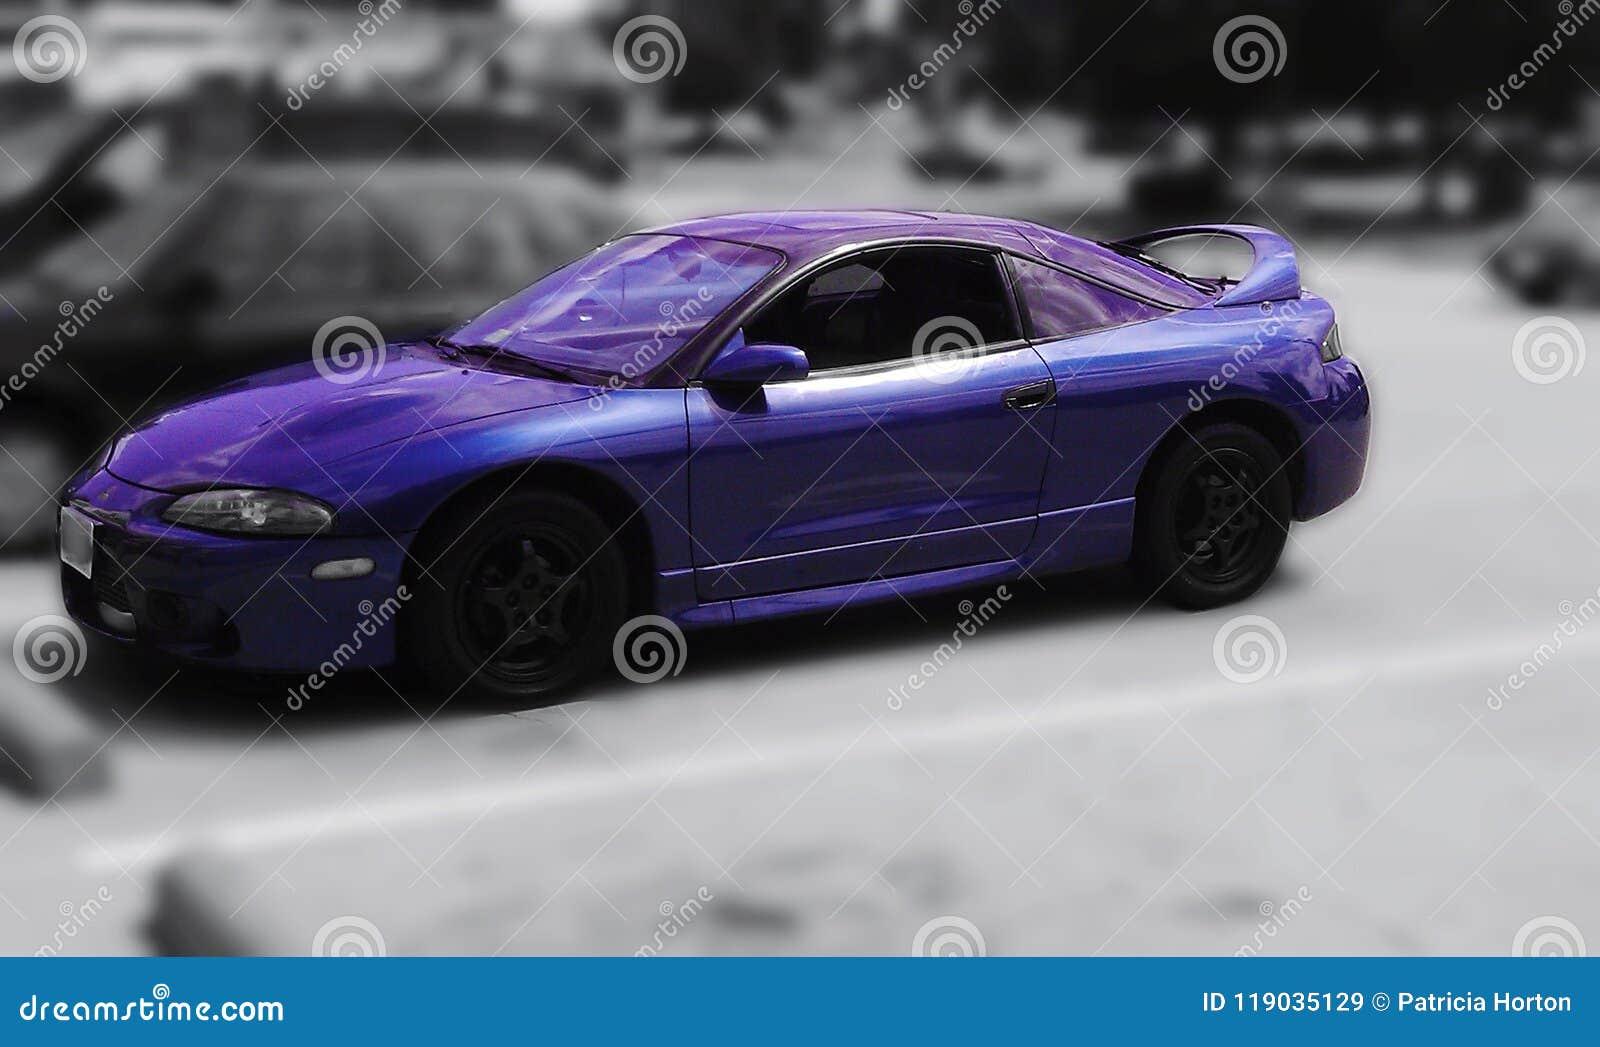 98 Mitsubishi eclipse gst color change